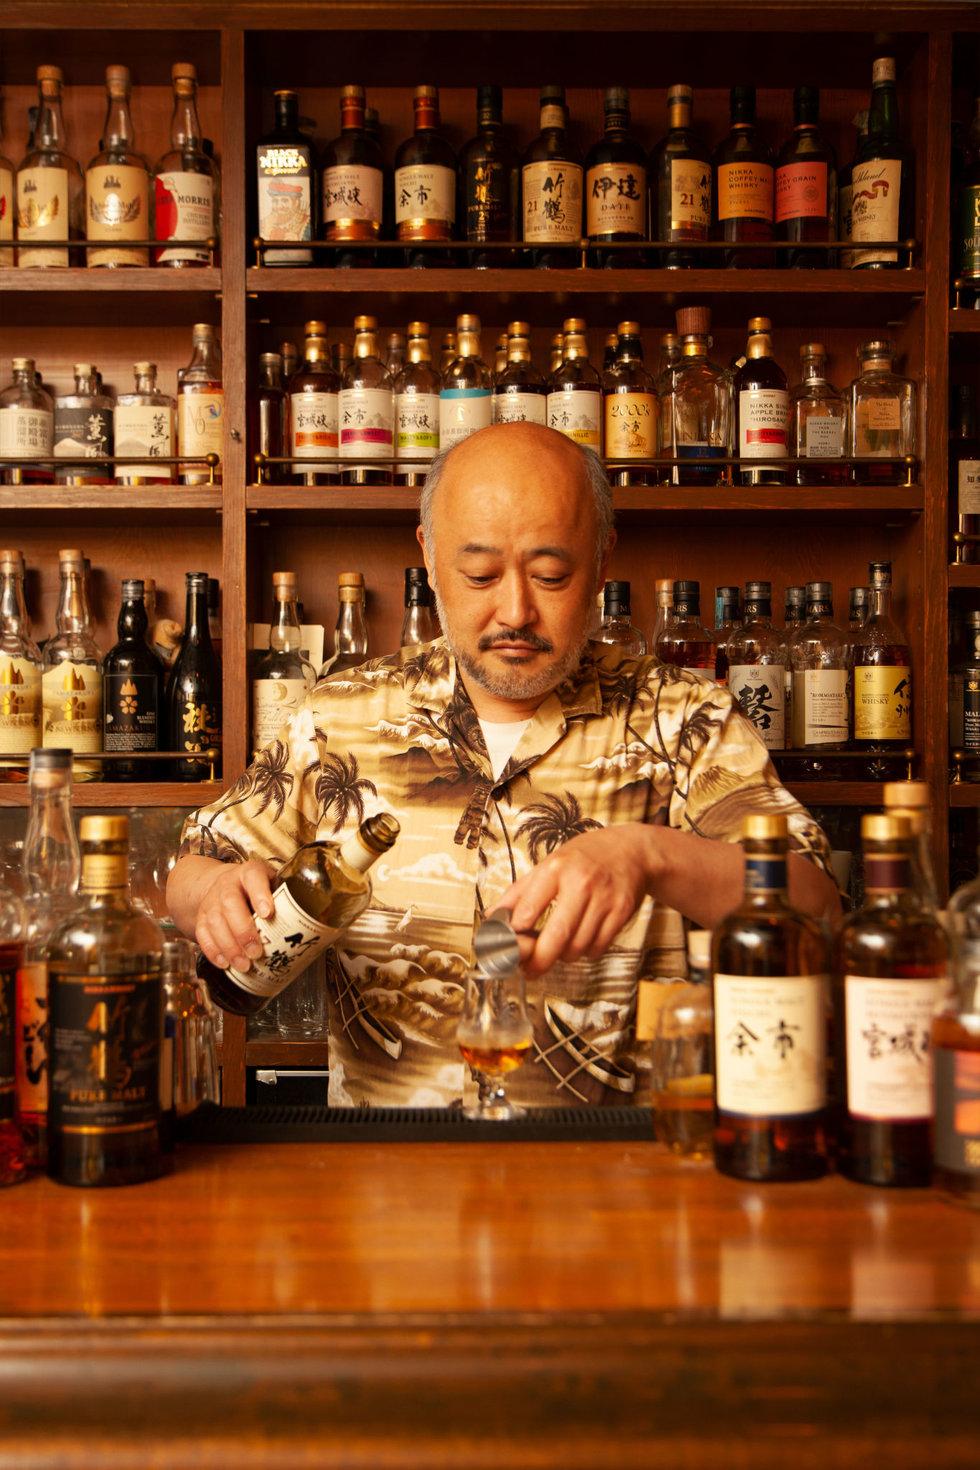 Atsushi Horigami pours a dram at Tokyo's Zoetrope Shot Bar